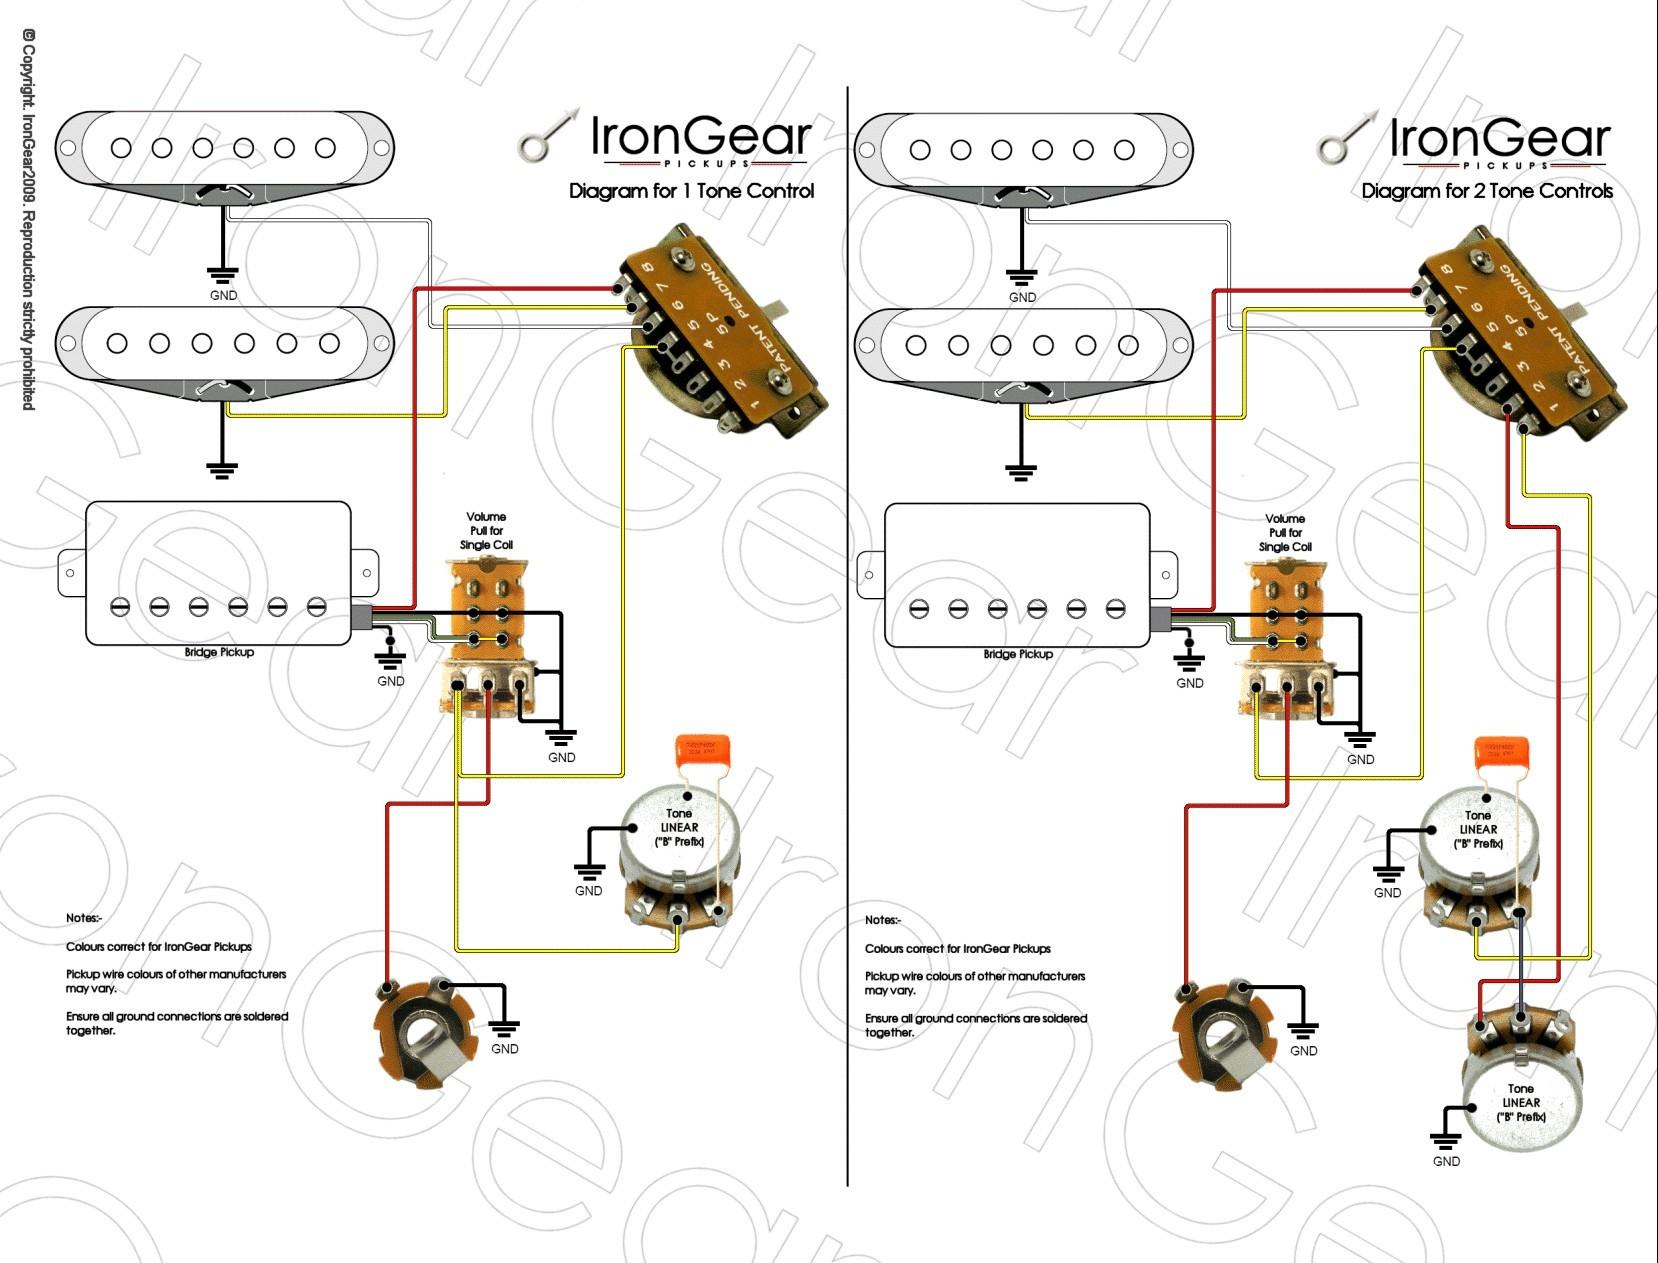 Three Humbucker Wiring Diagram Inspiration Three Humbucker Wiring Diagram Fresh 1 X Humbucker 2 X Single Coil